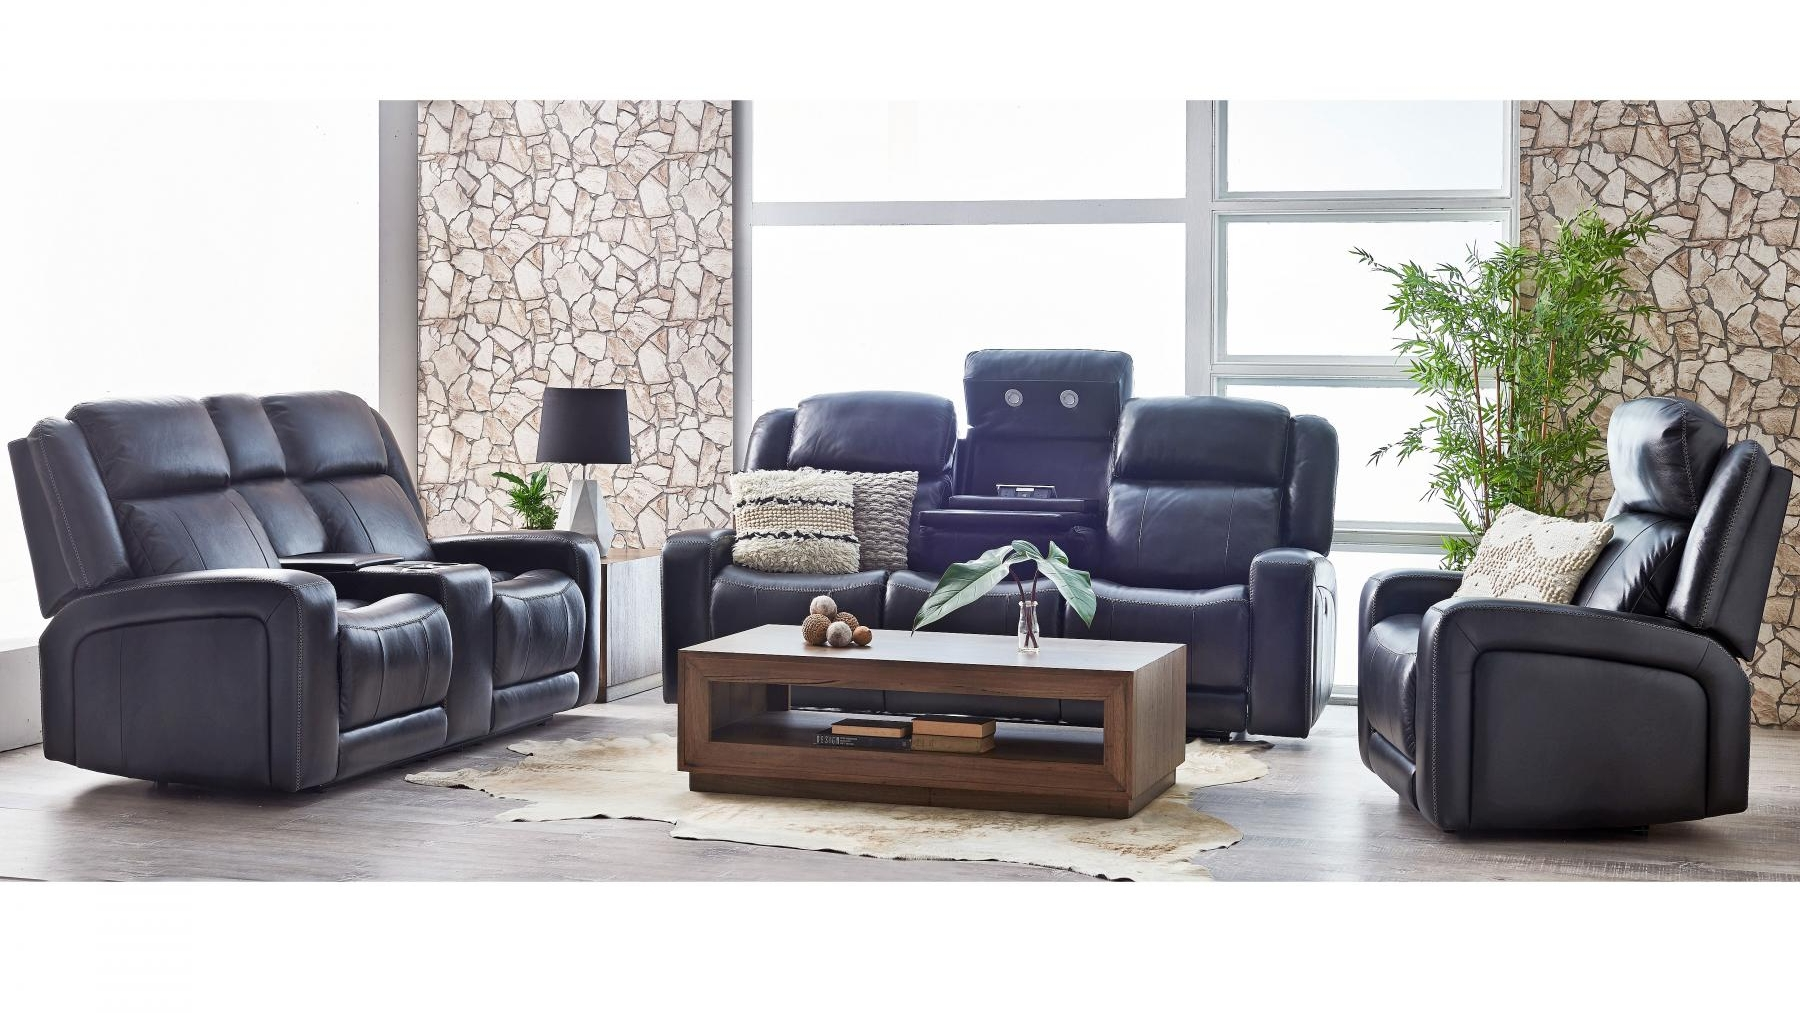 Buy Hampden 3-Seater Powered Leather Recliner Sofa | Harvey ...